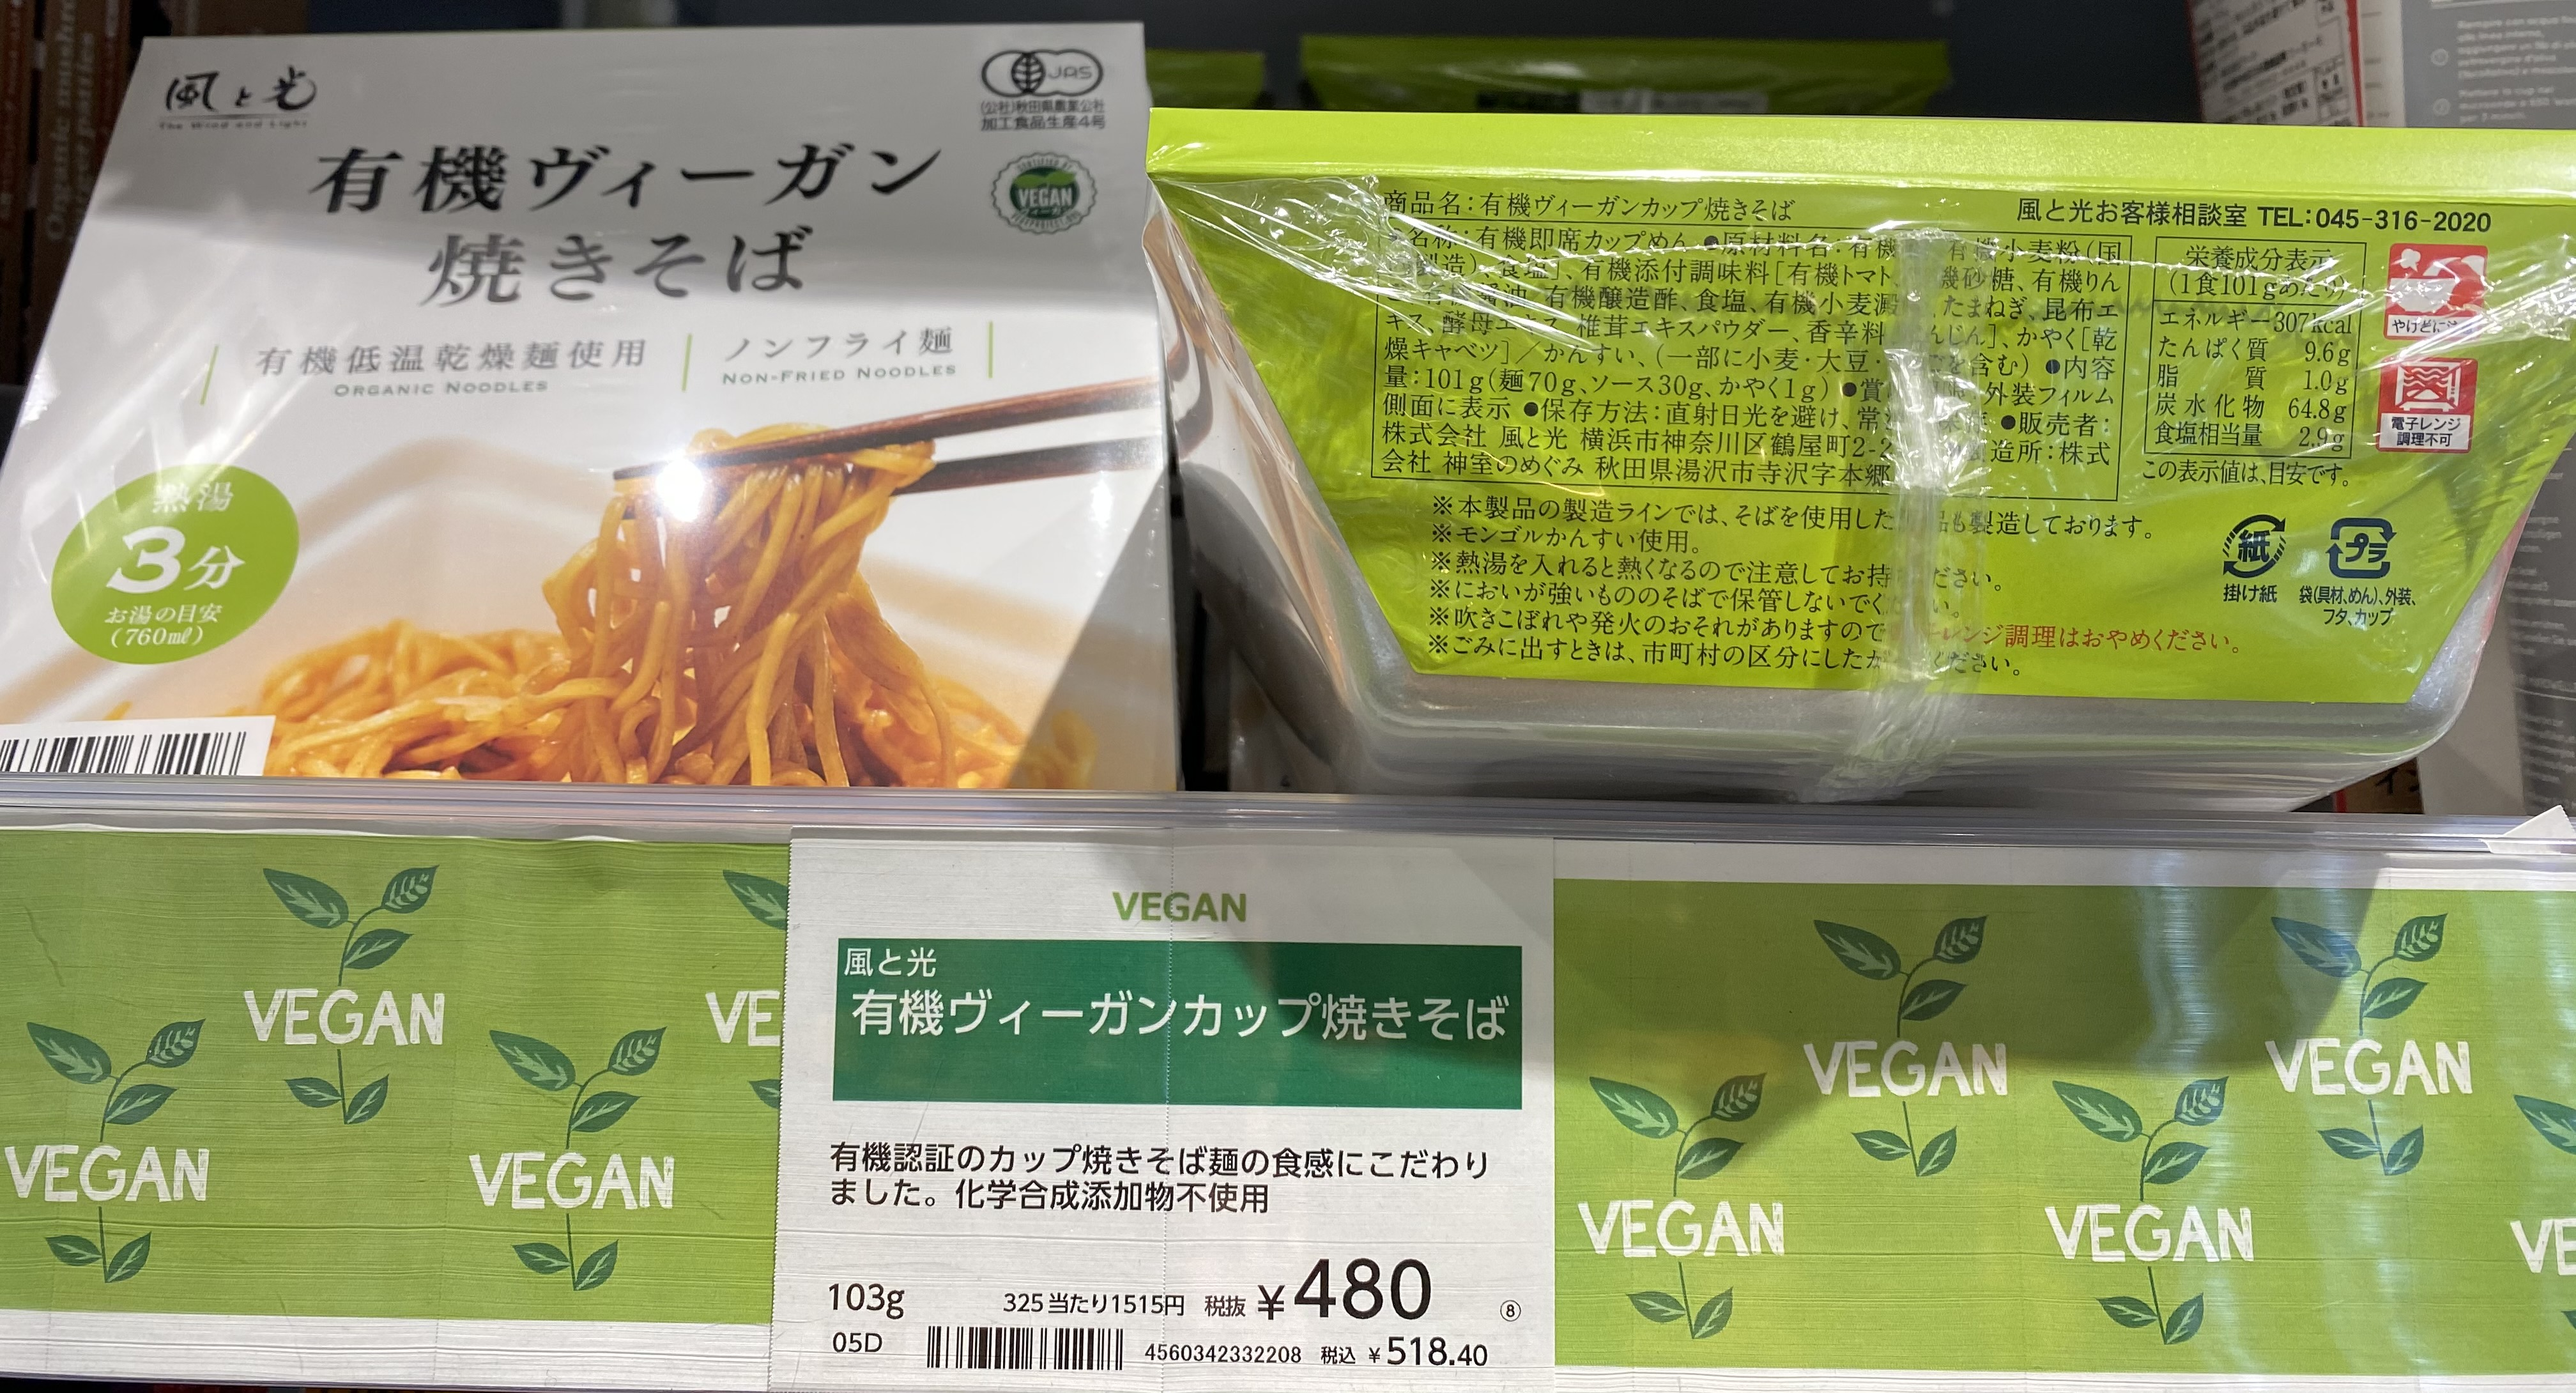 Kaze to Hikari Organic Vegan Yakisoba